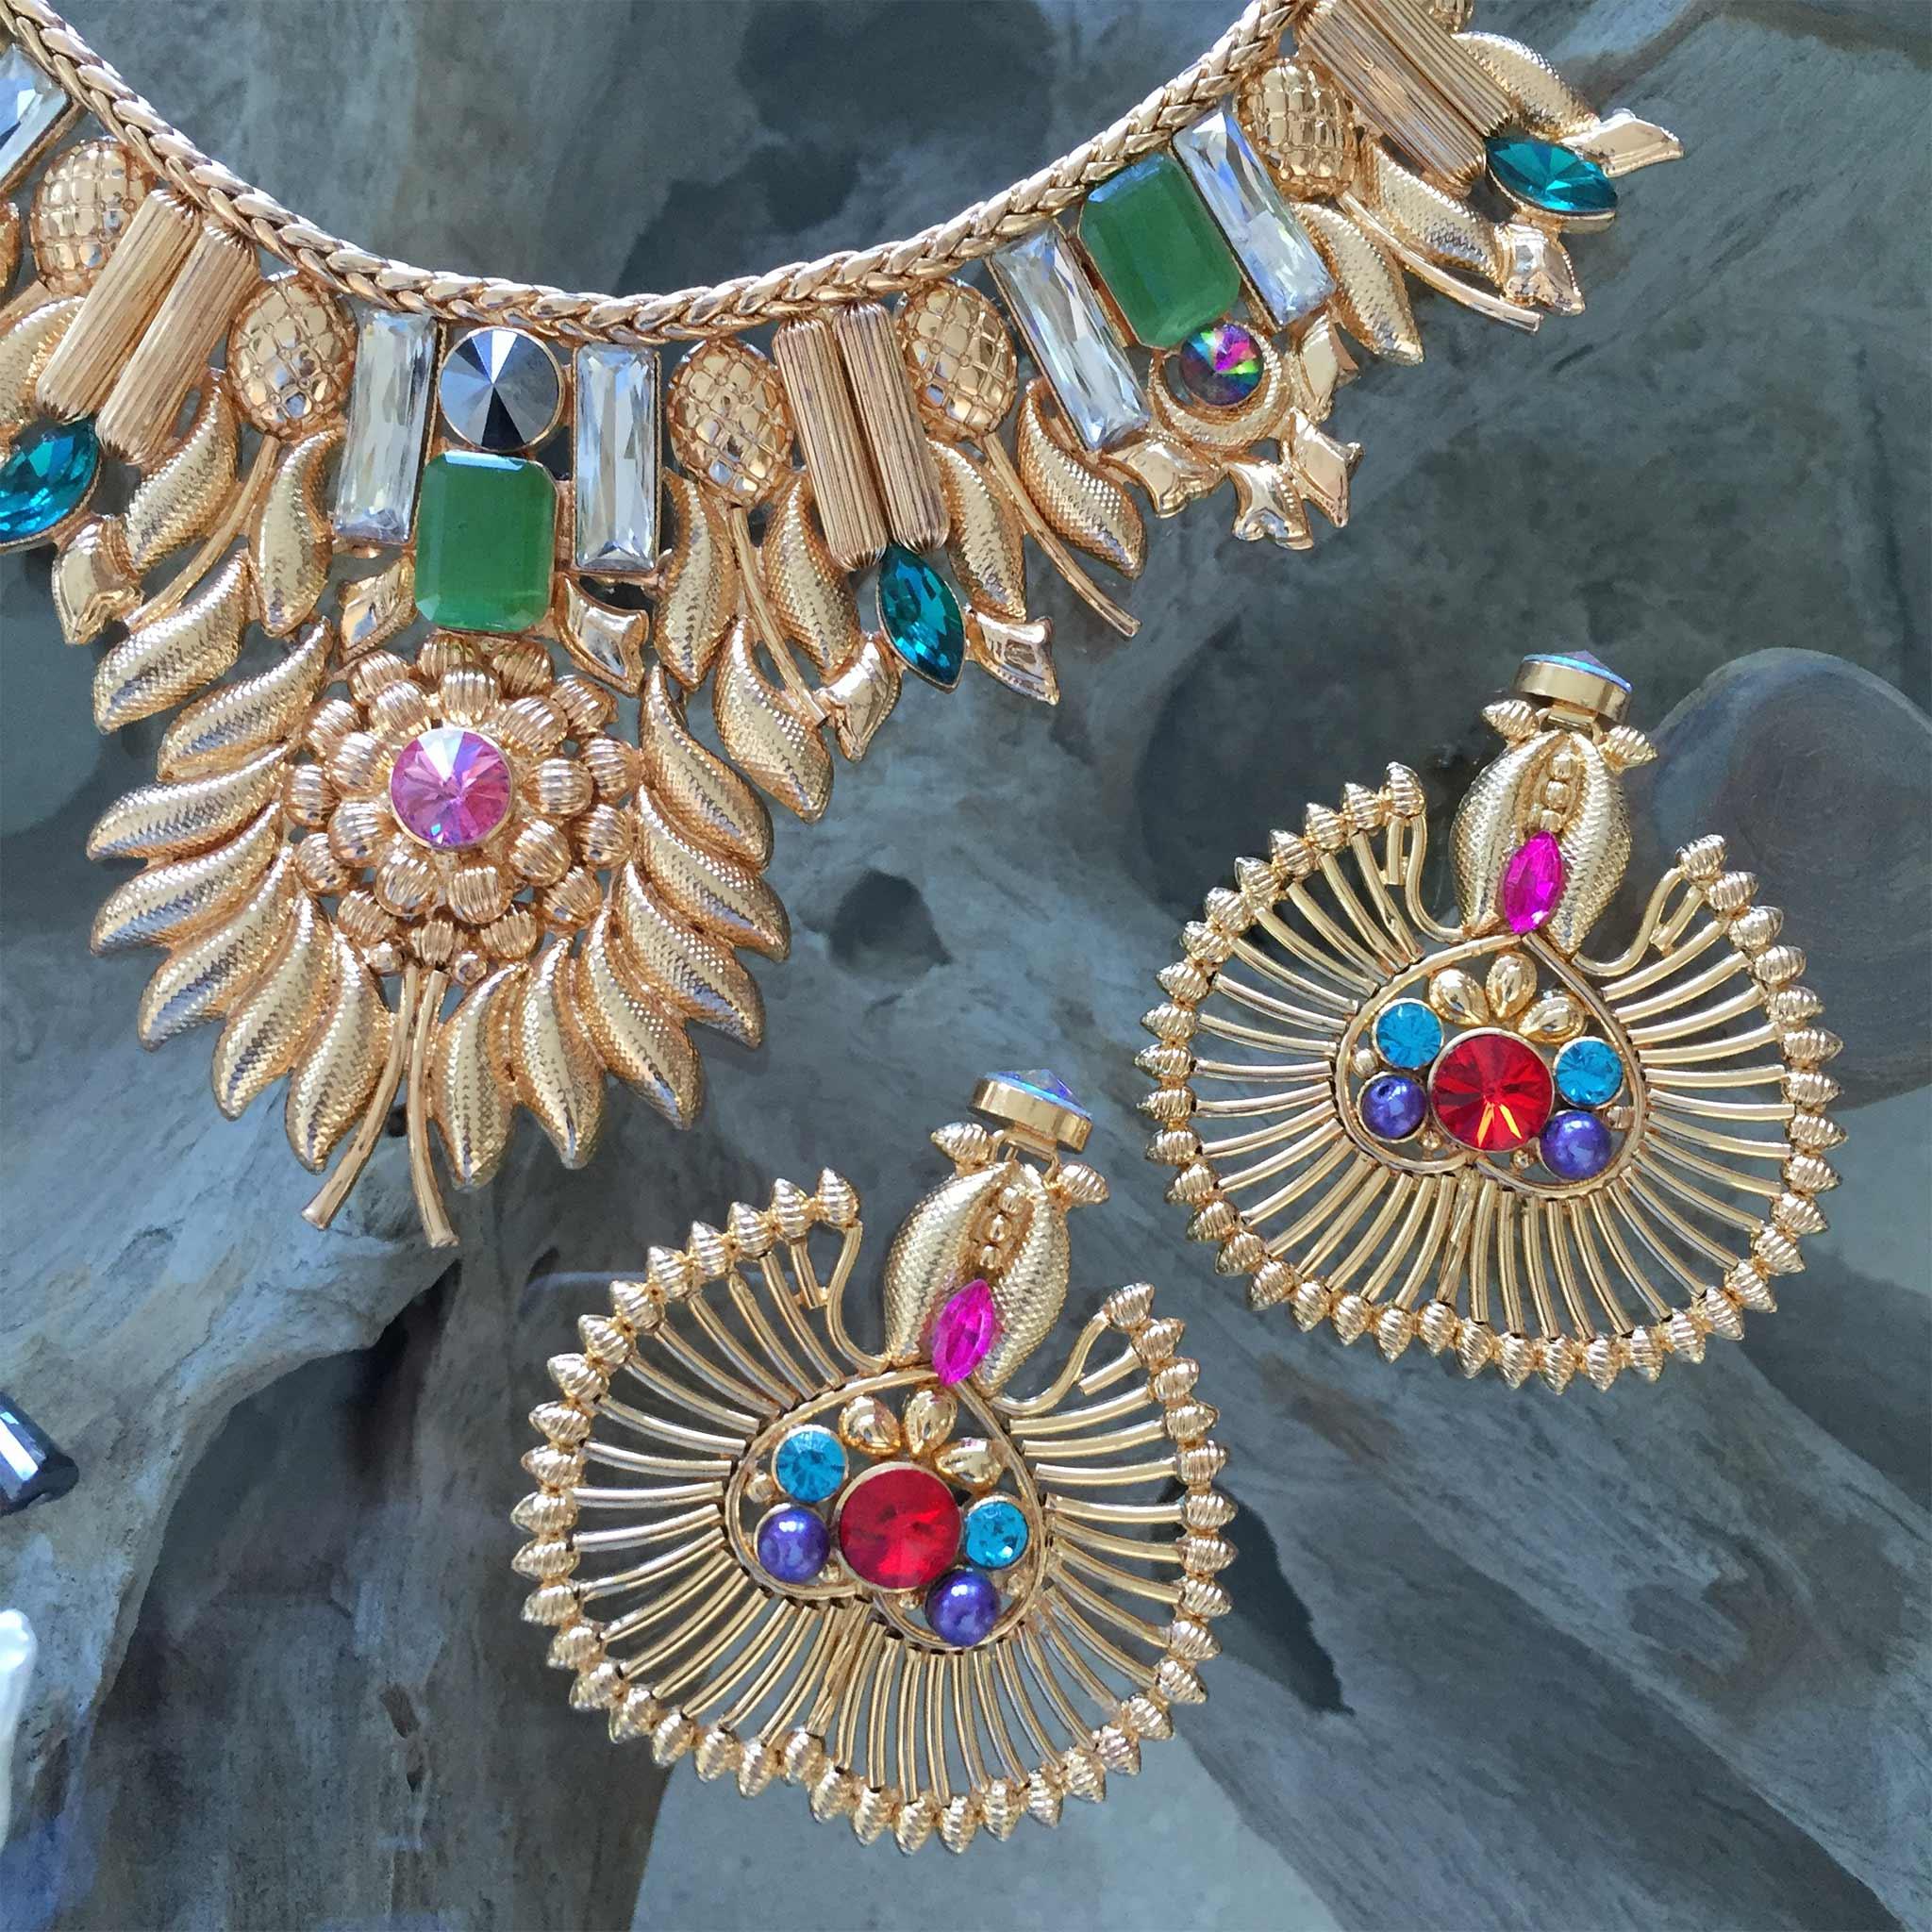 Valliyan 18Kt Gold Plated Roshanara Fan Earrings